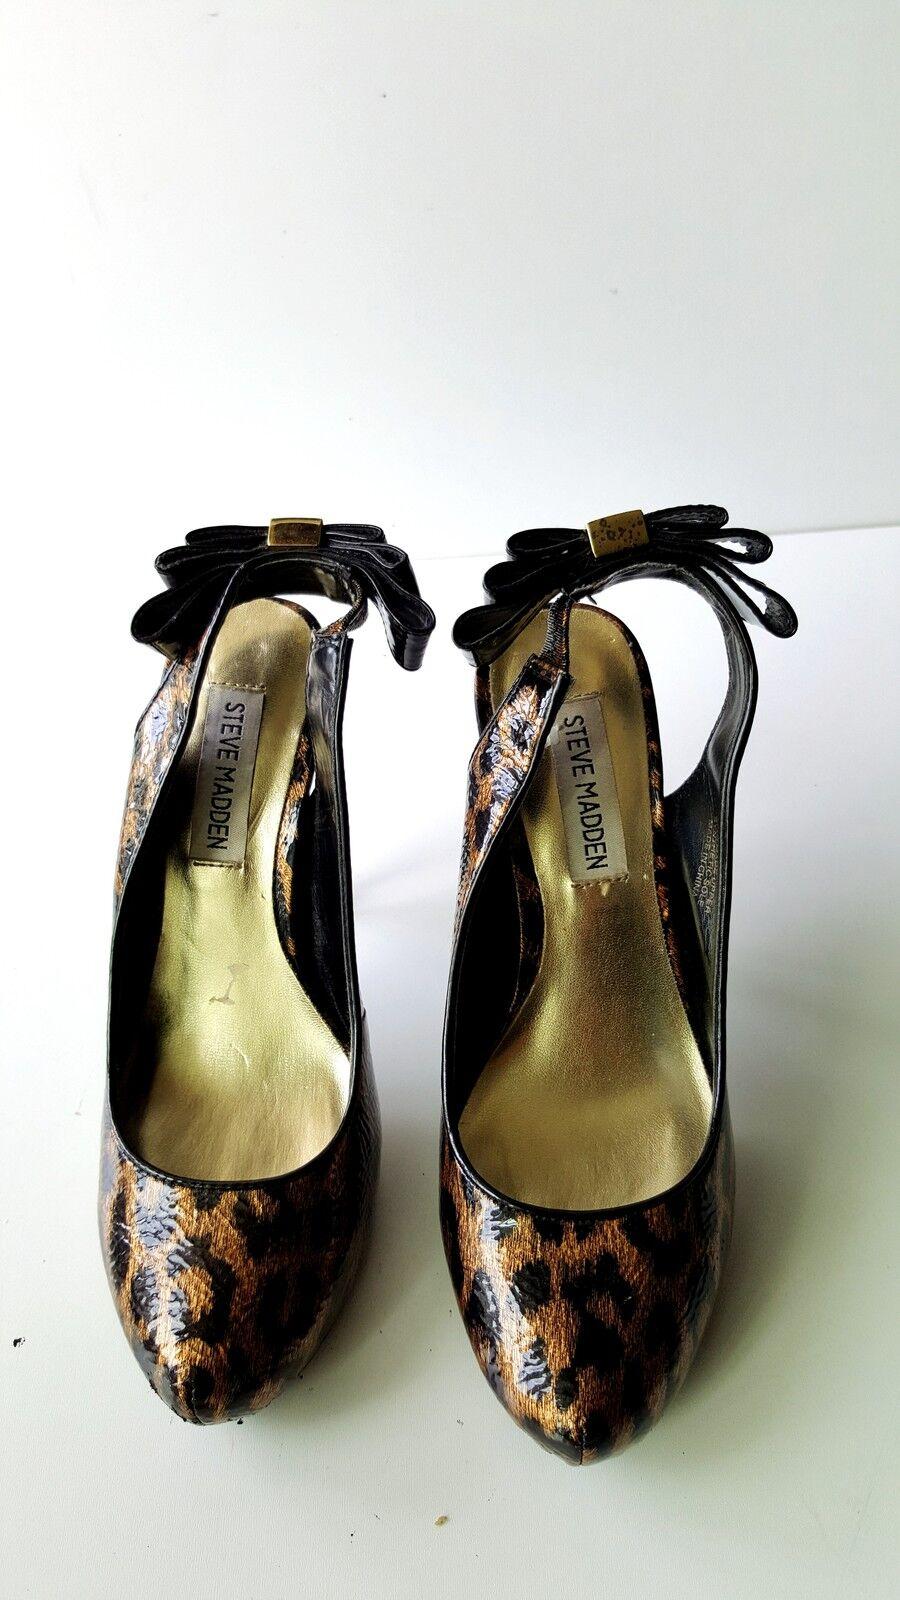 Steve Madden Damens Print High Heels Schuhes with Bow Größe 6